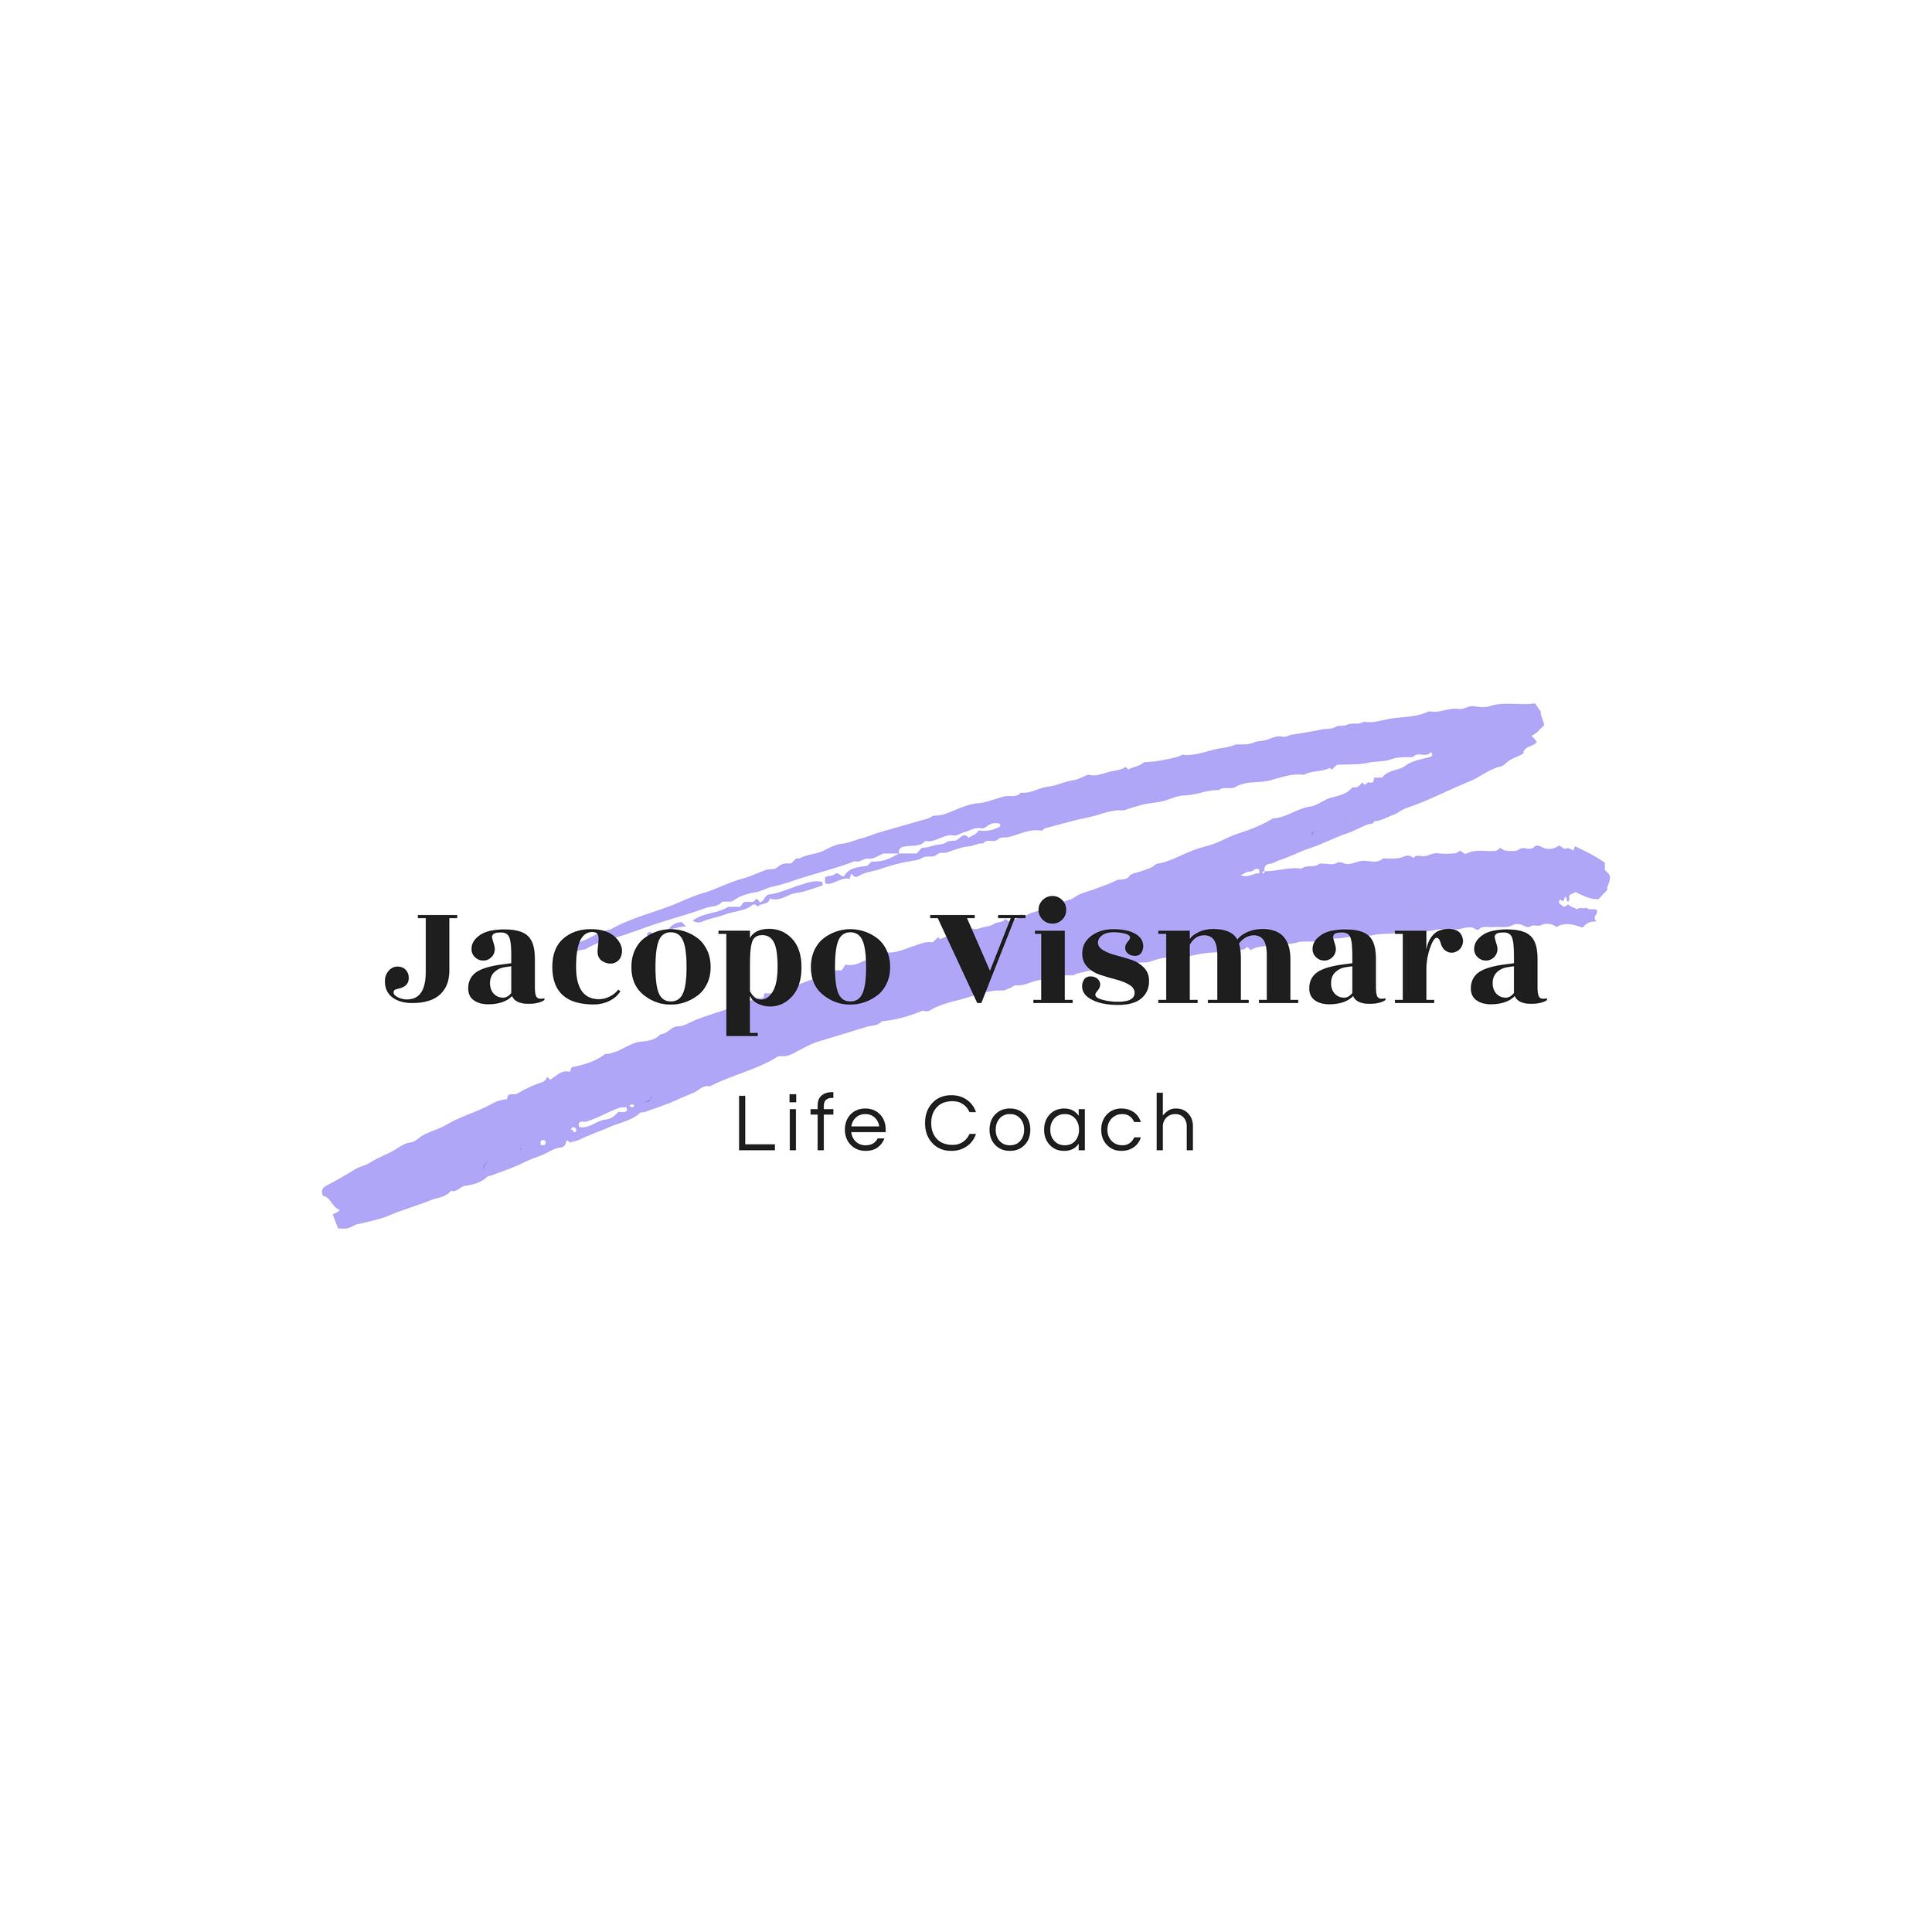 Jacopo Vismara